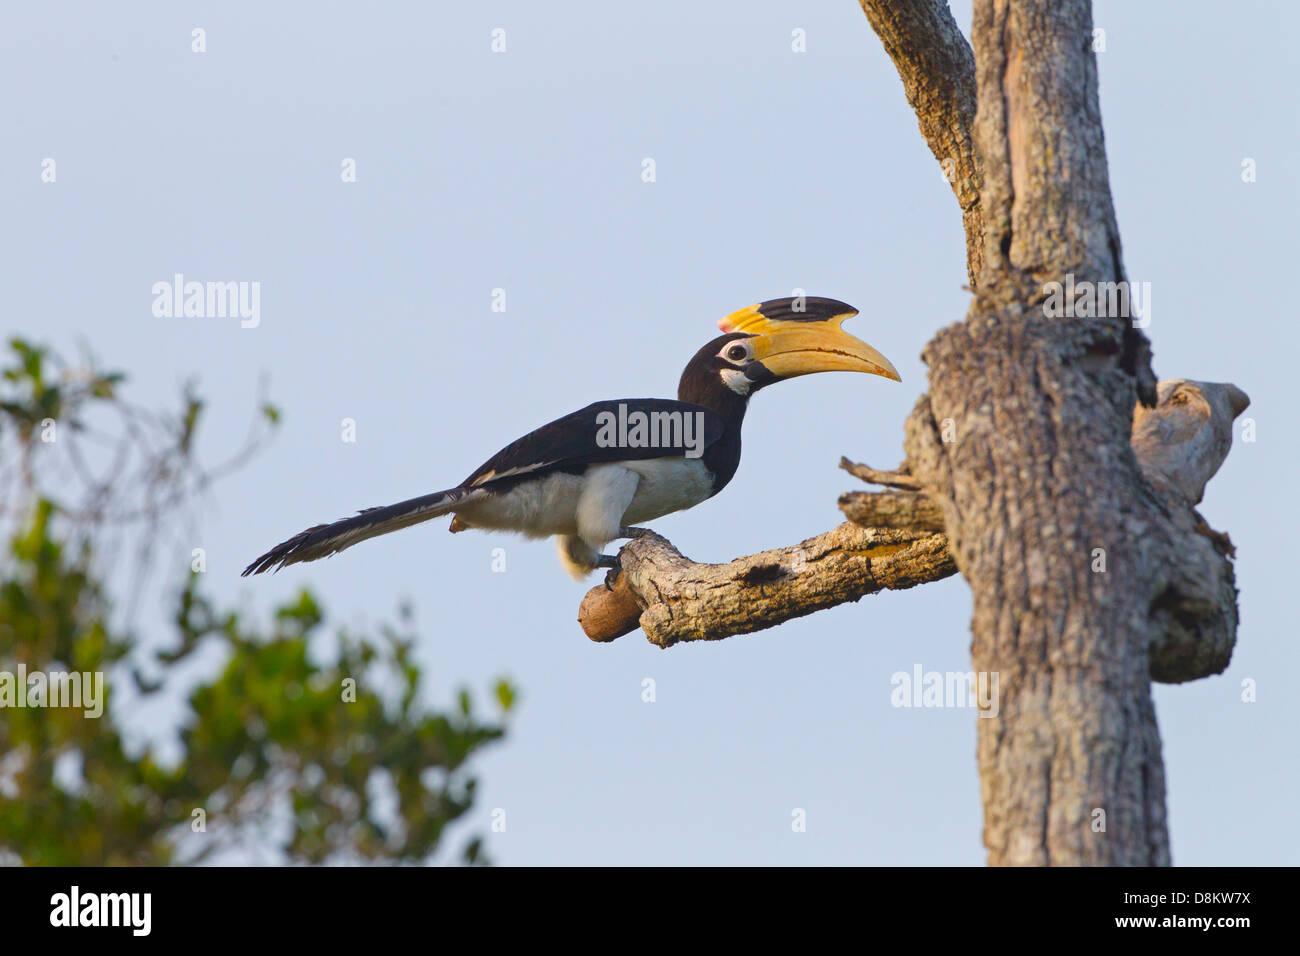 Malabar Pied Hornbill Anthracoceros coronatus - Stock Image